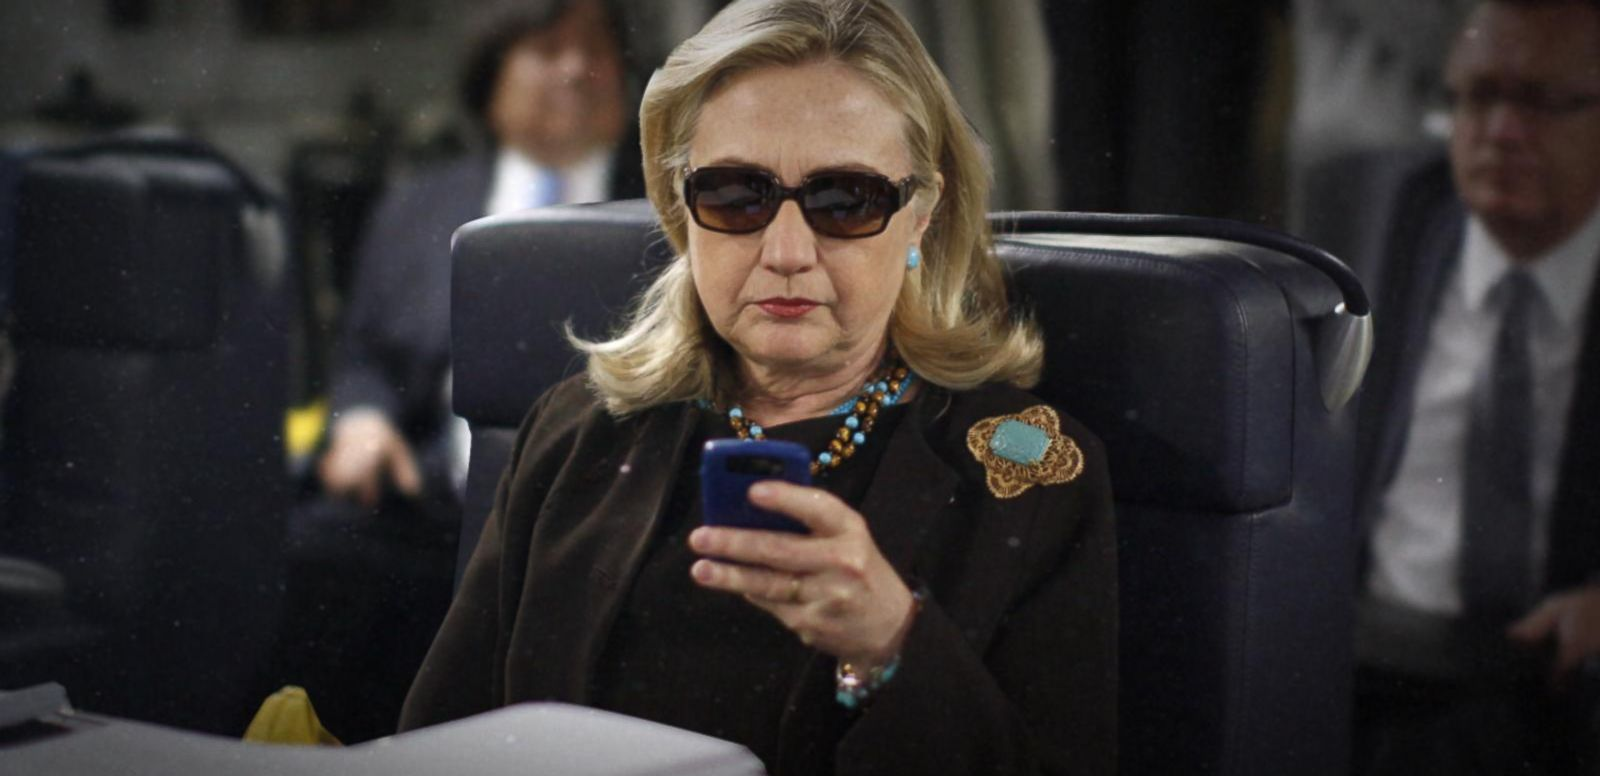 VIDEO: Nixon Biographer Evan Thomas: Hillary Clinton Has 'Nixonian Attributes'